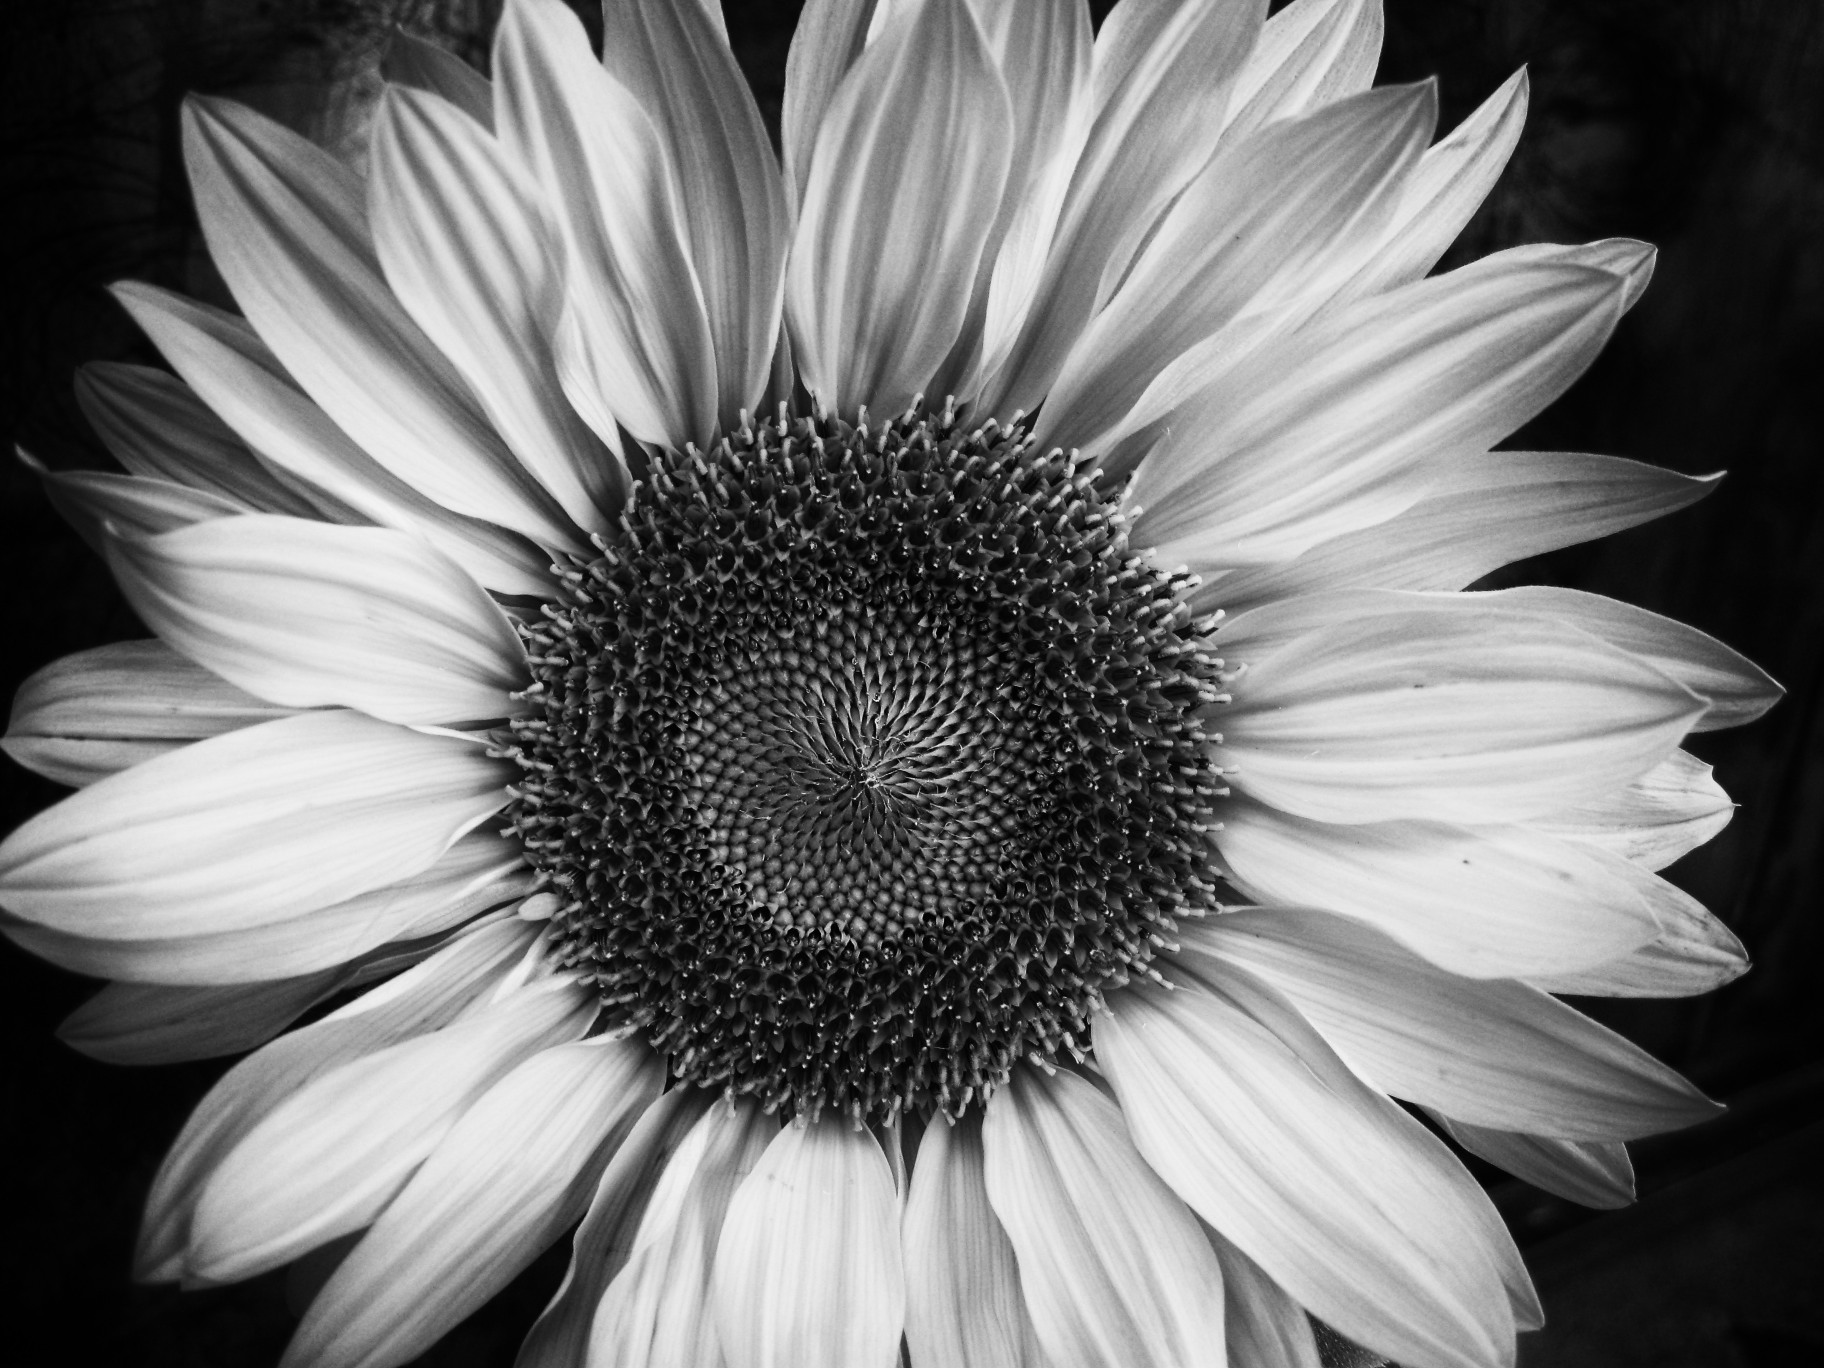 Black And White Images Of Flowers 11 Desktop Wallpaper ...